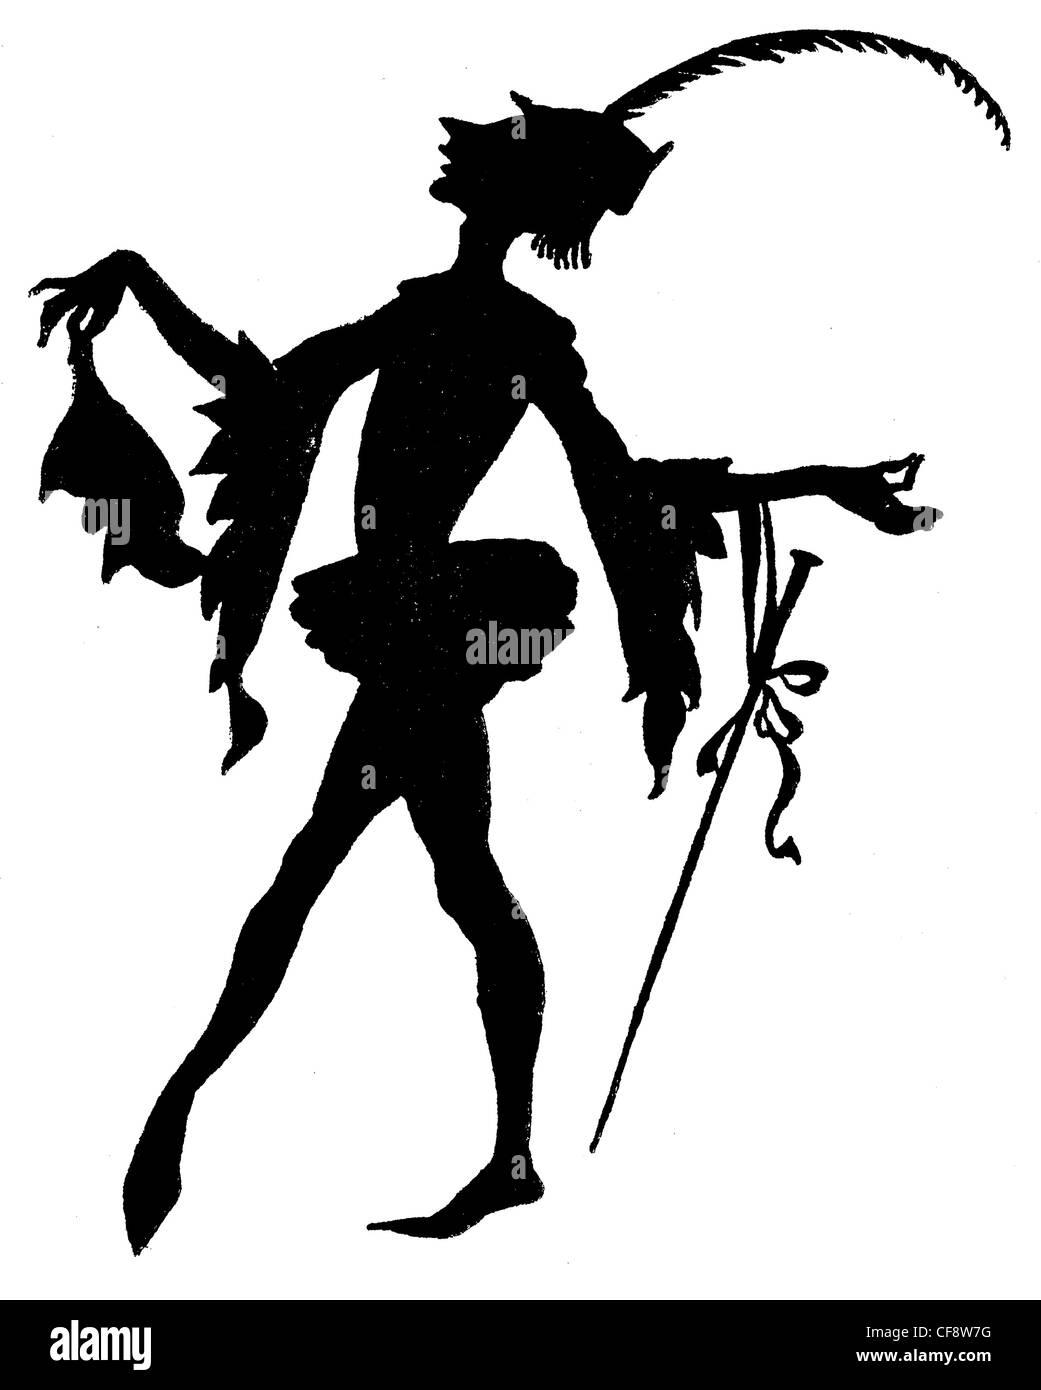 The Sleeping Beauty Arthur Rackham 1920 wicked fairy witch fairy fairies book magic magical myth spindle legend - Stock Image